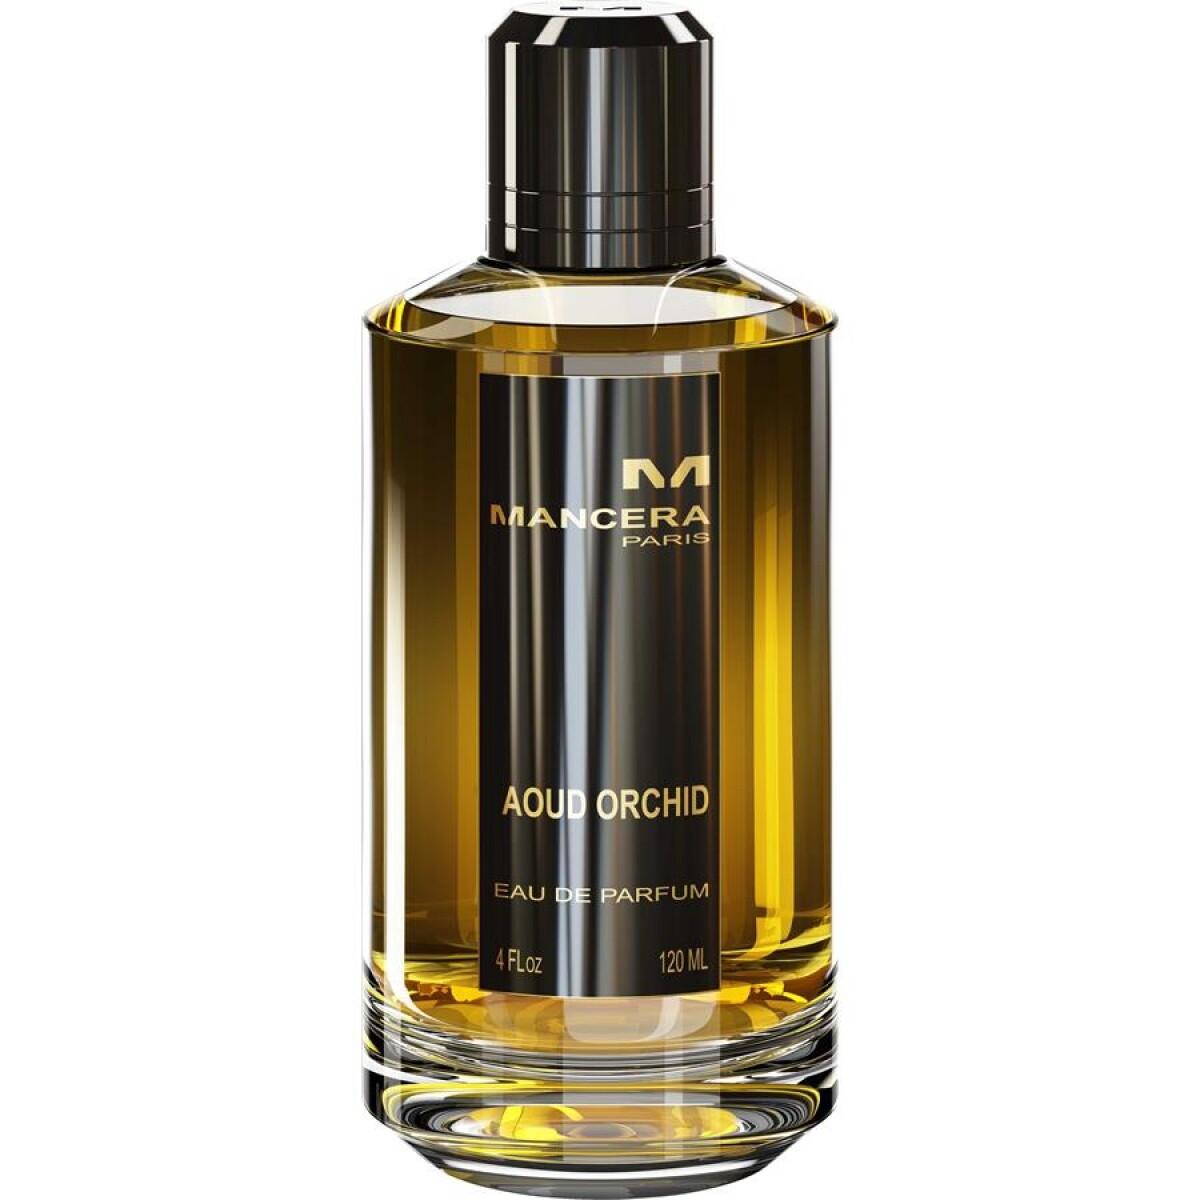 Mancera | Aoud Orchid 120ml | Parfum | 7702 diversen